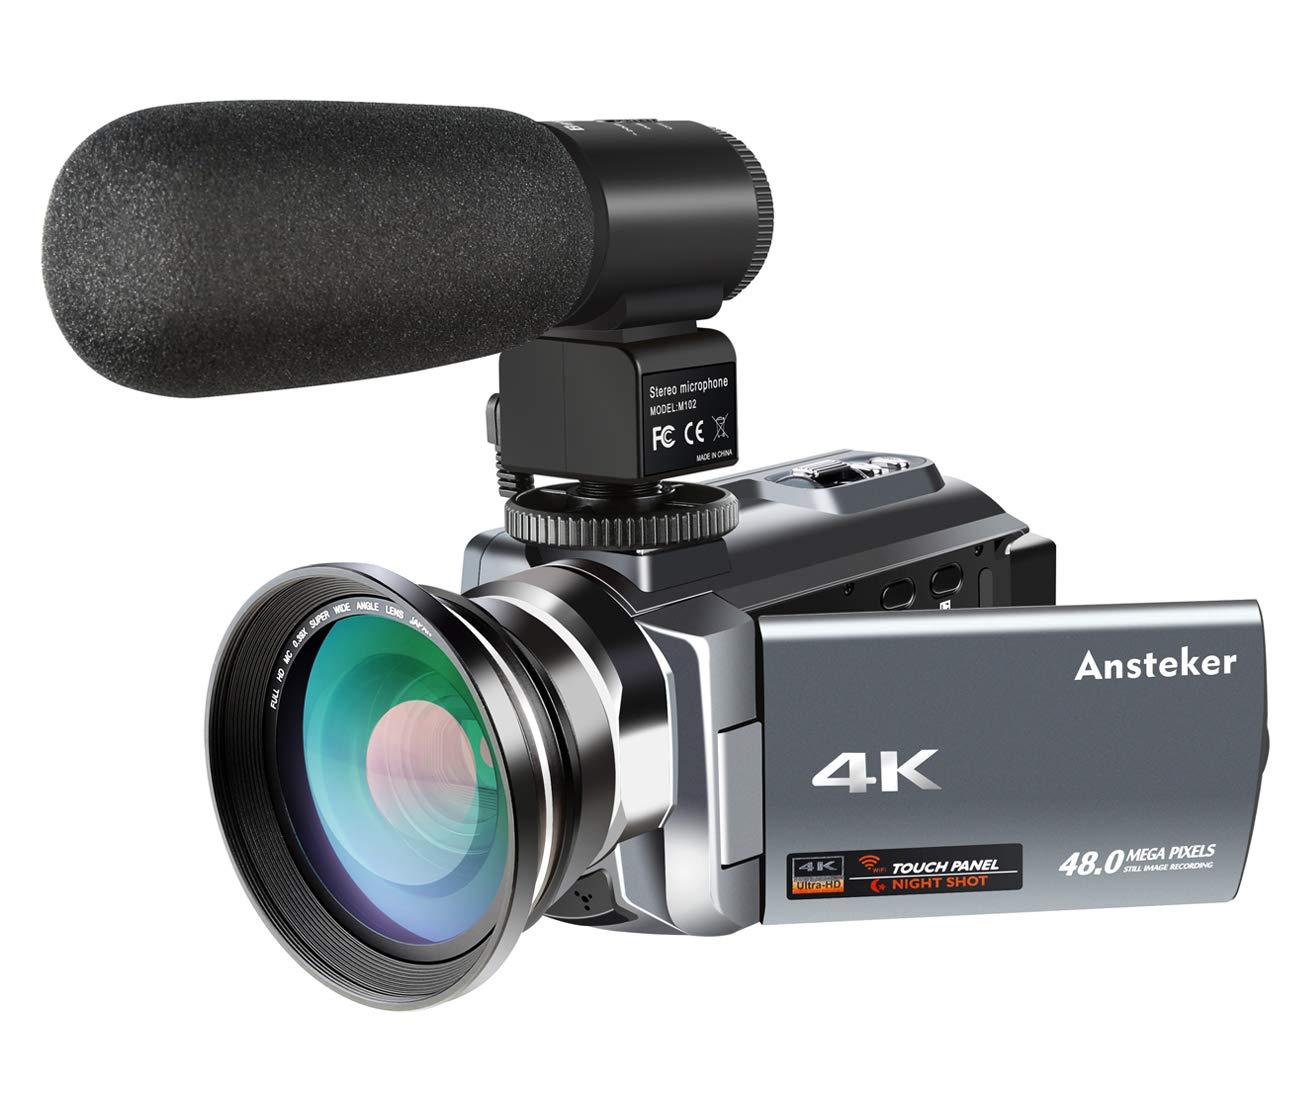 Sony Hdr Pj410 Camcorder Im Test 2018 Expertentesten Pj810 Handycam Ansteker Bby534 Mo